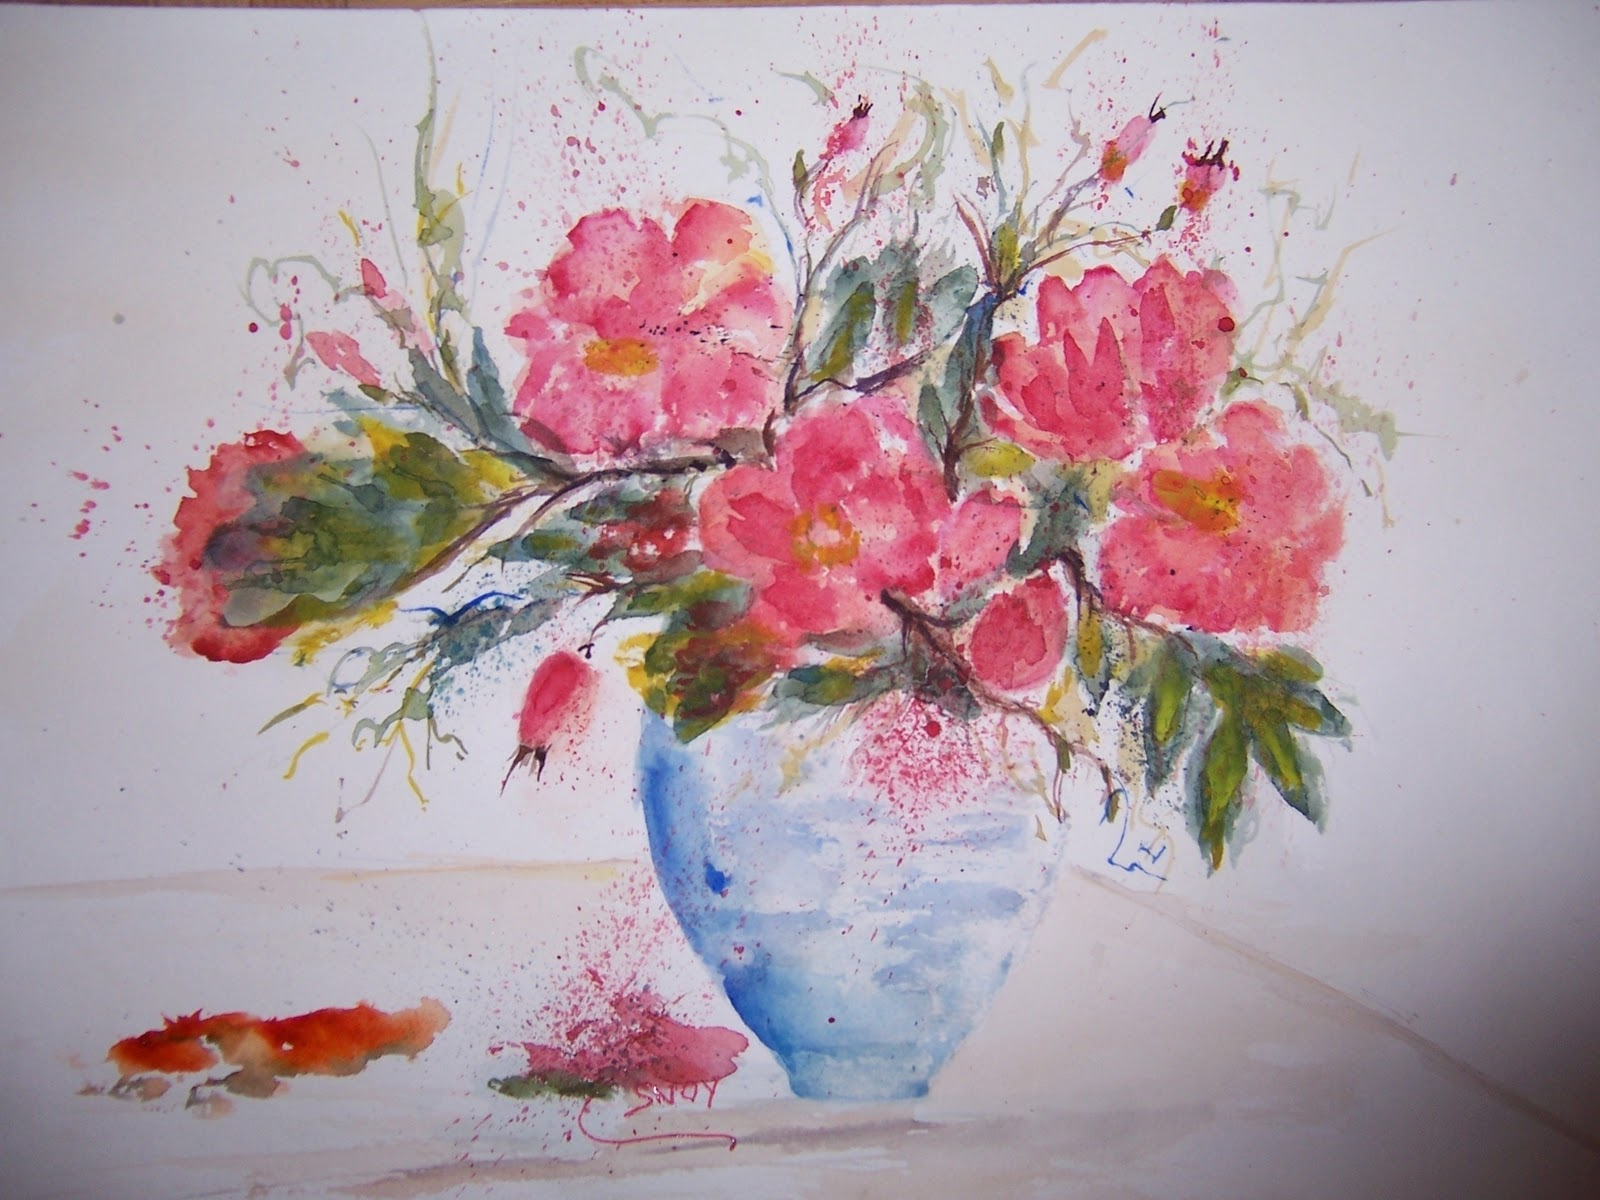 Aquarelle von CSnoy Blumen